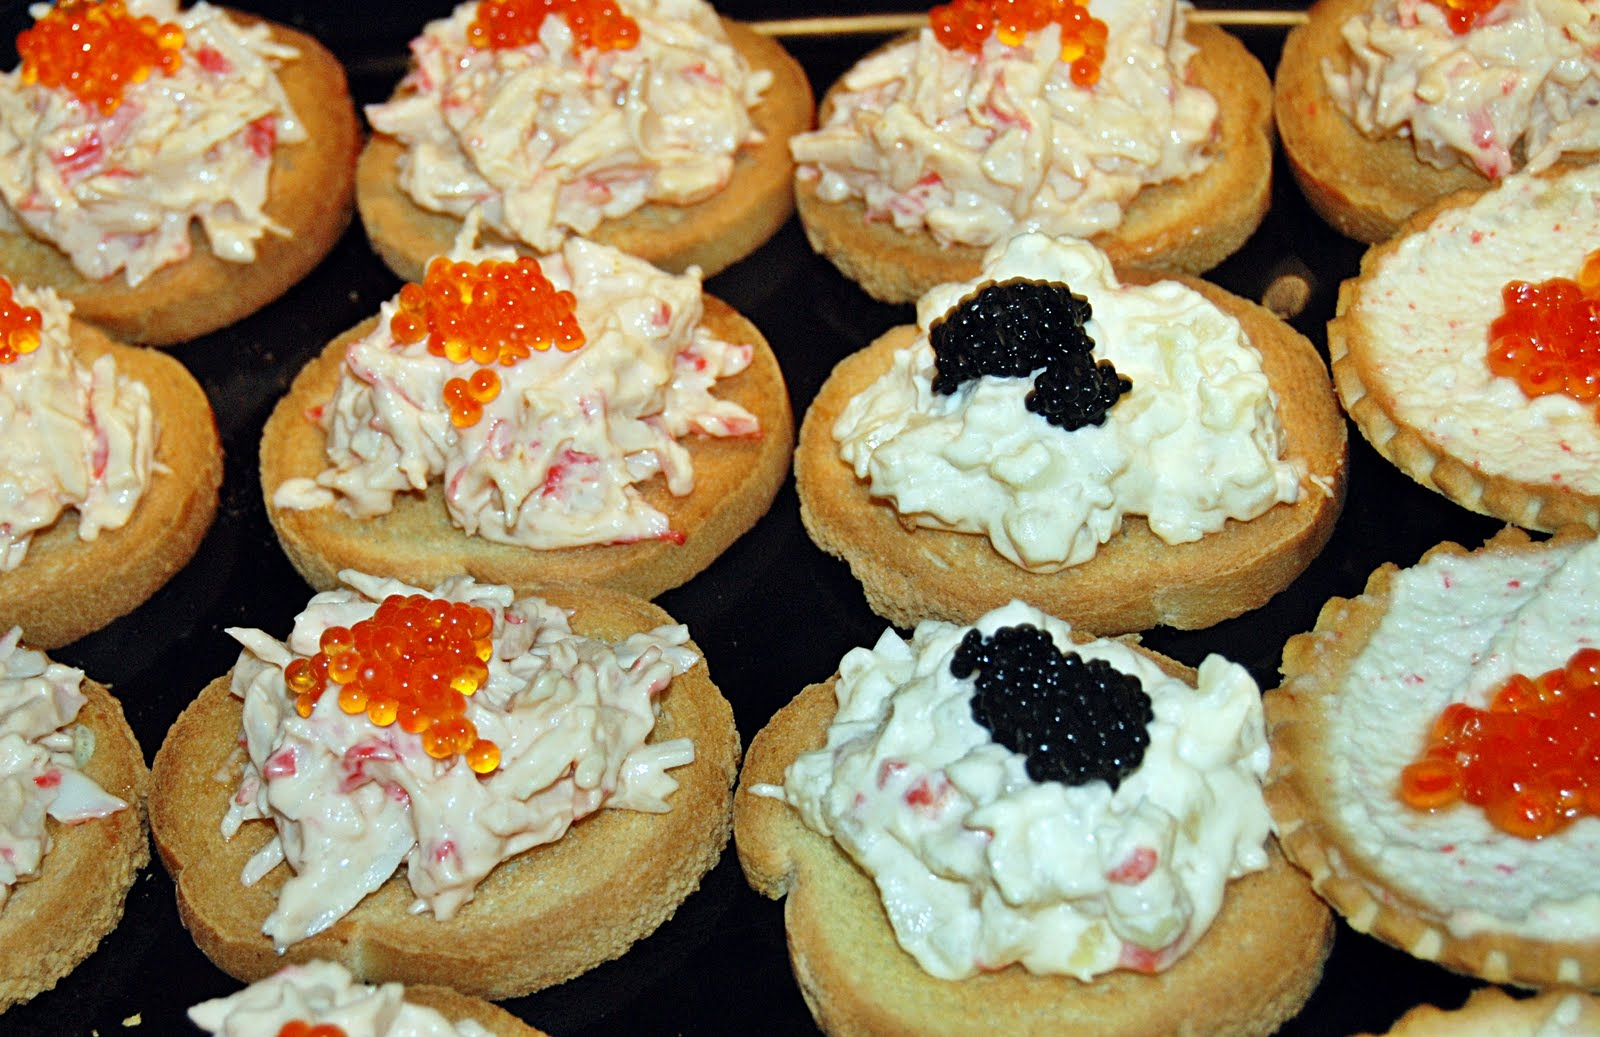 Canap s caviar lidiacusac for Canape with caviar